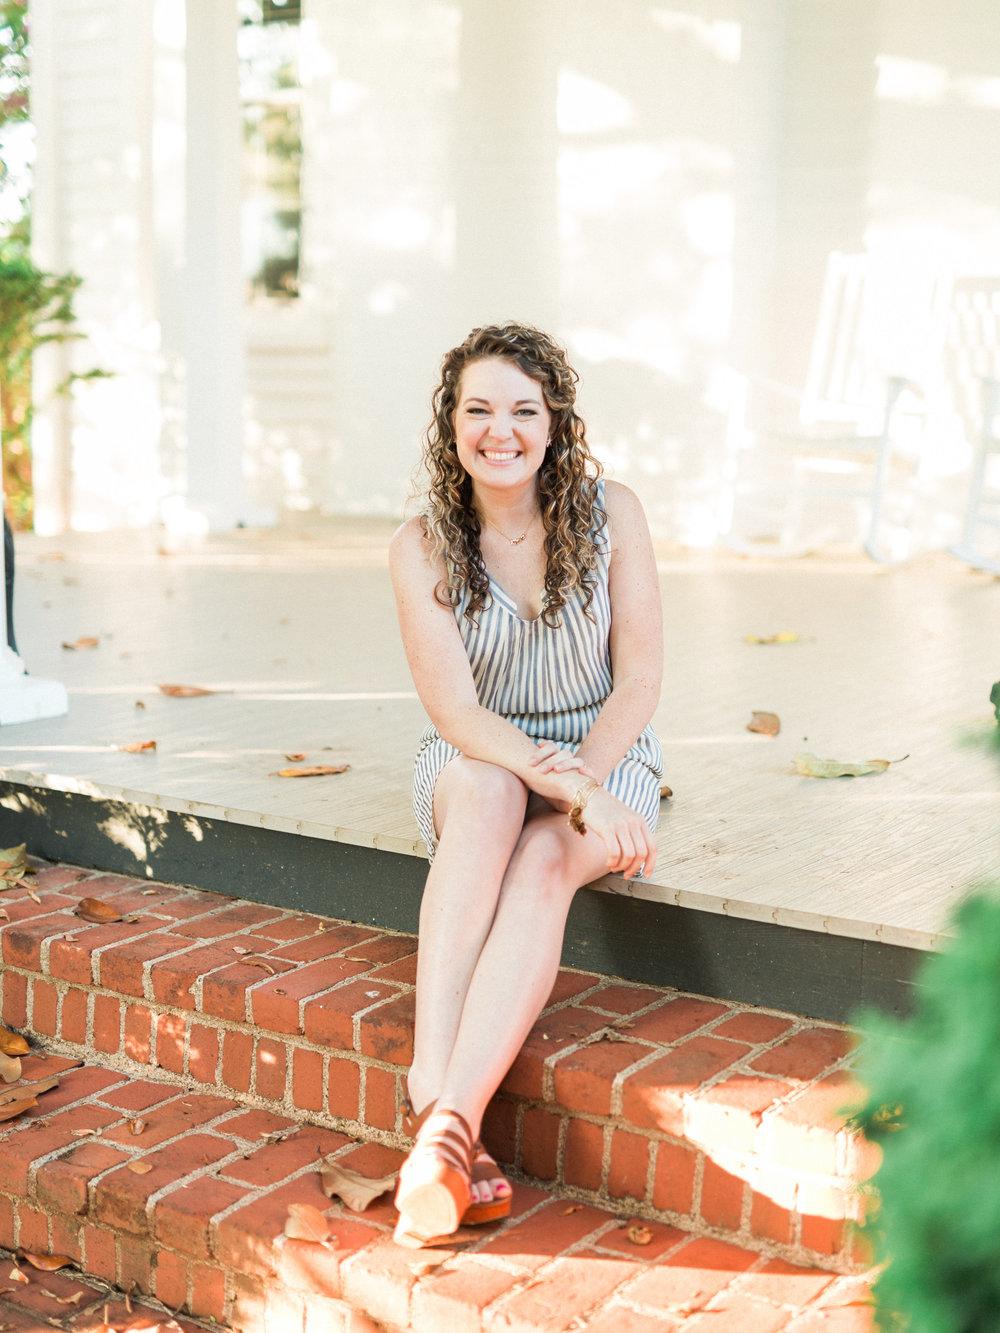 Setting up systems during the slow season || Lynchburg, Virginia Wedding Photographer || www.ashleyeiban.com